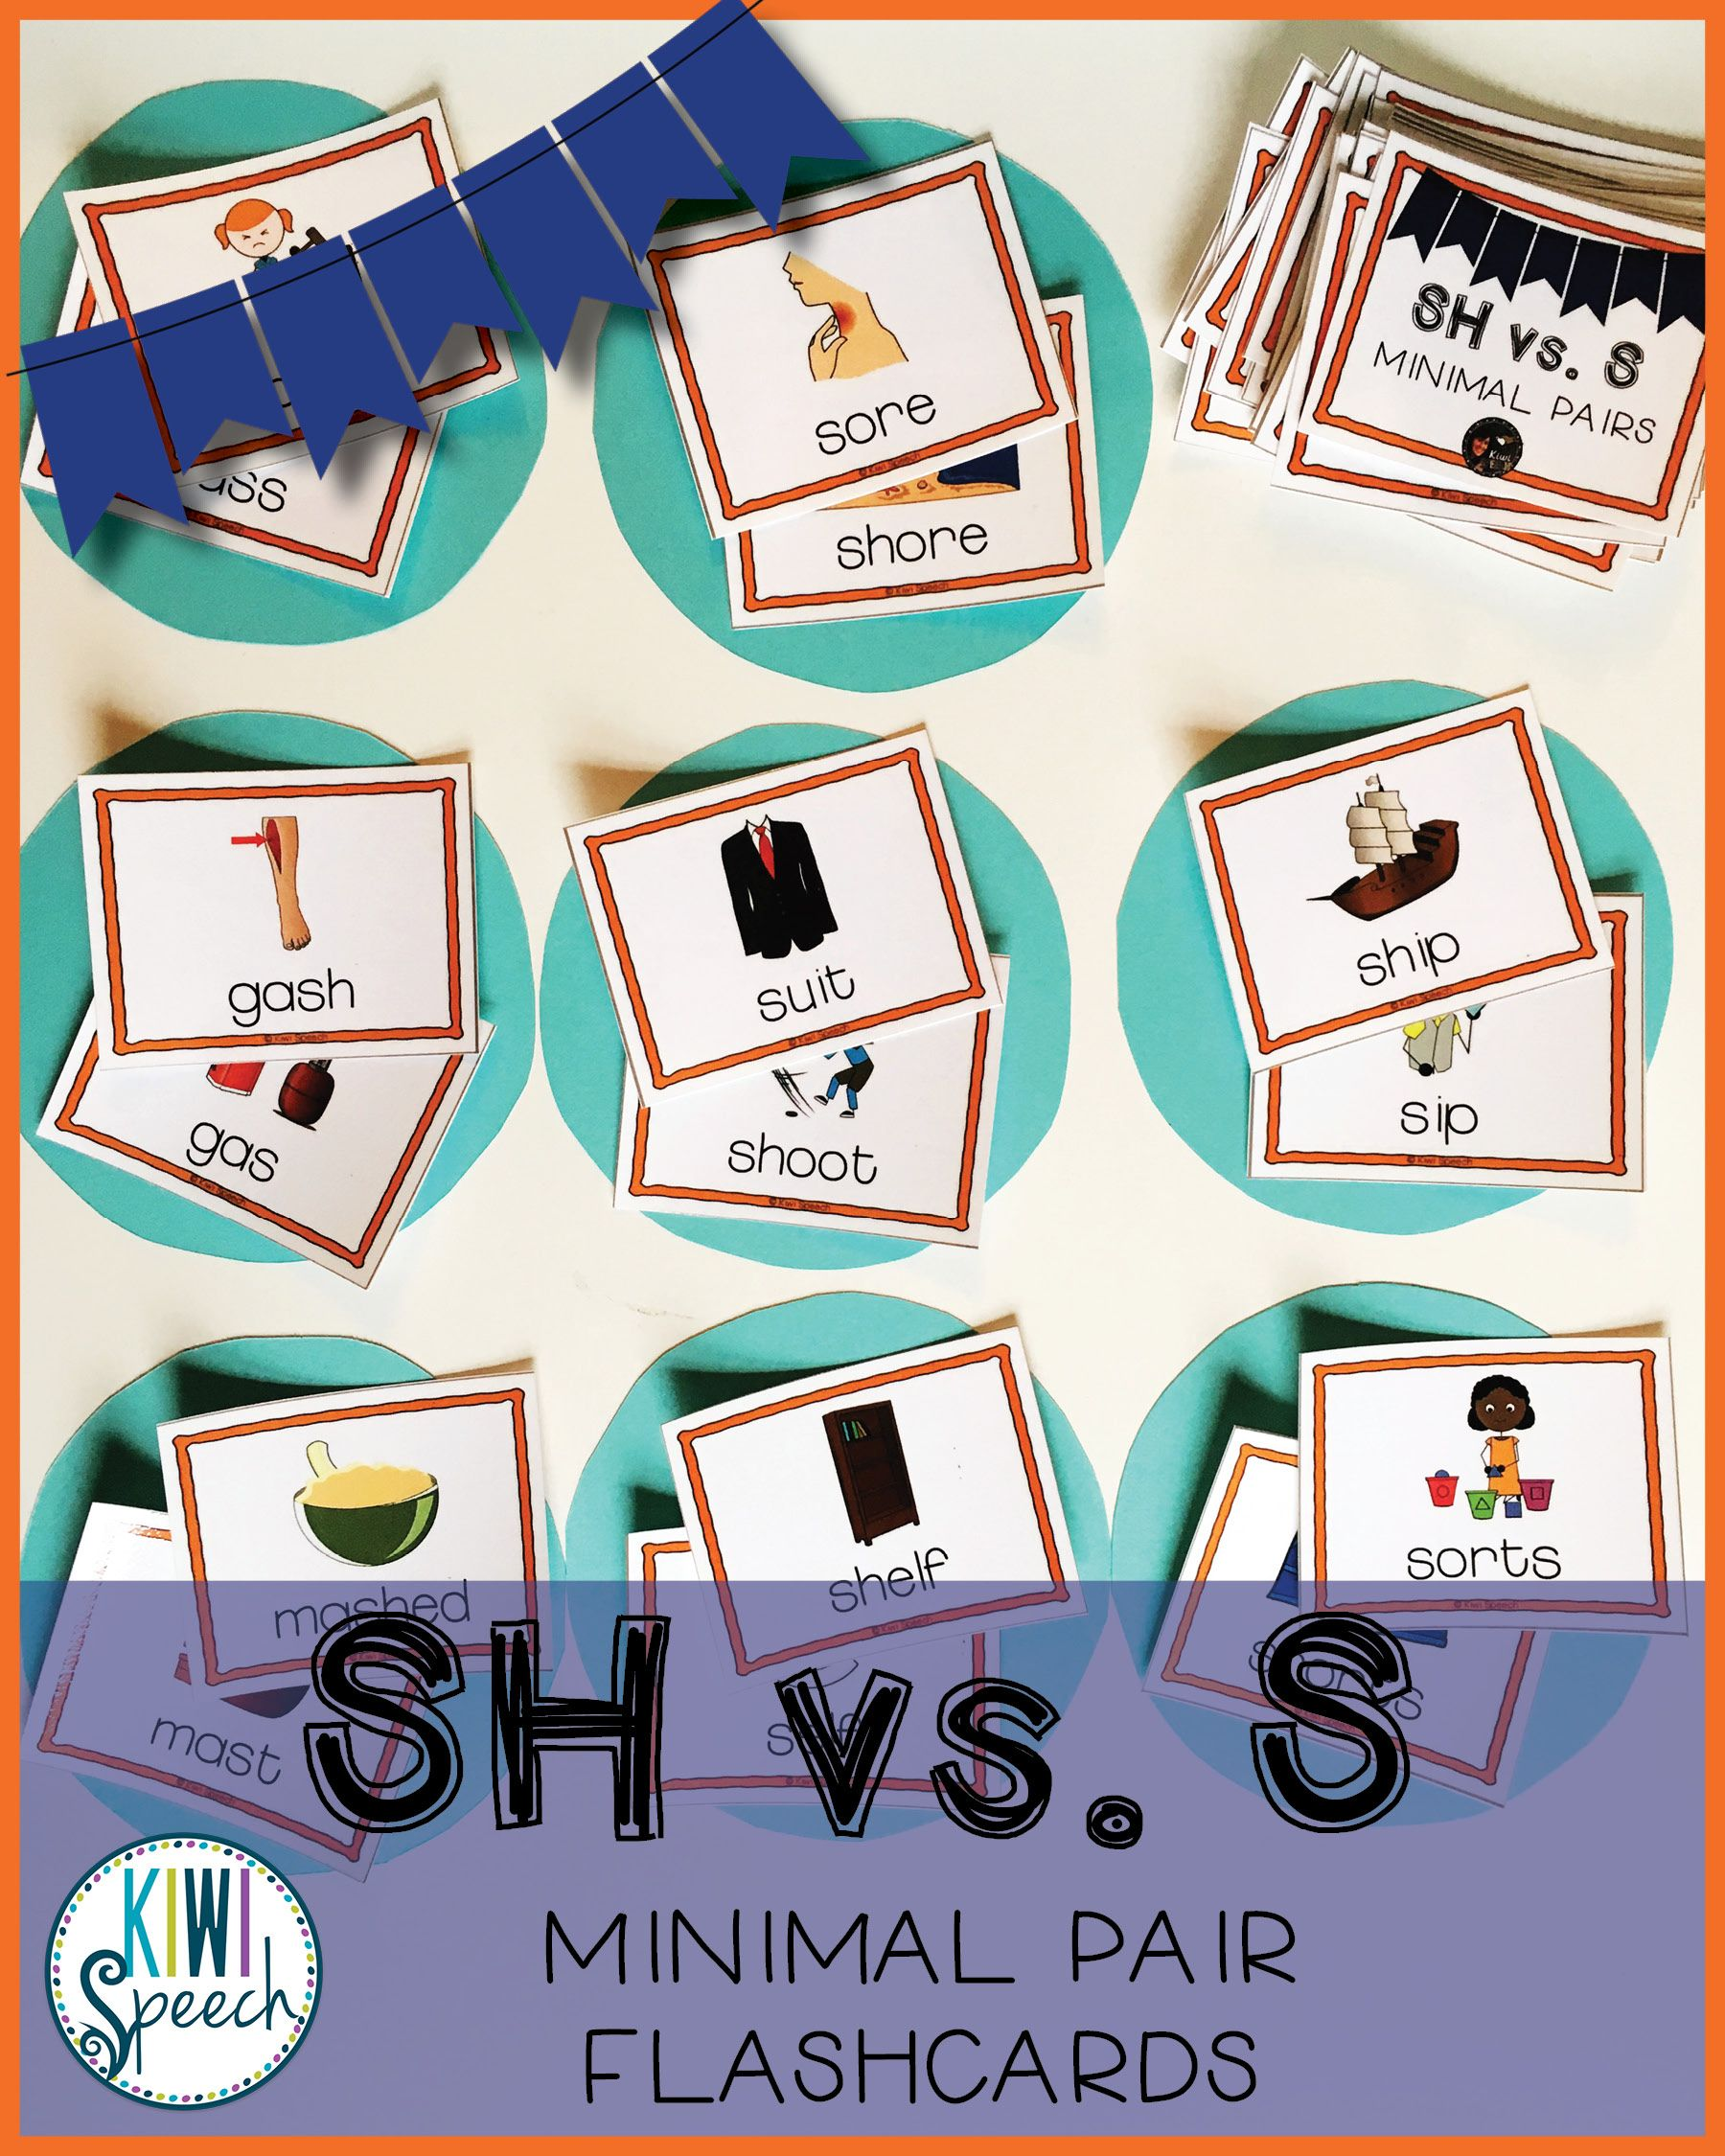 Sh Vs S Minimal Pairs Flashcards